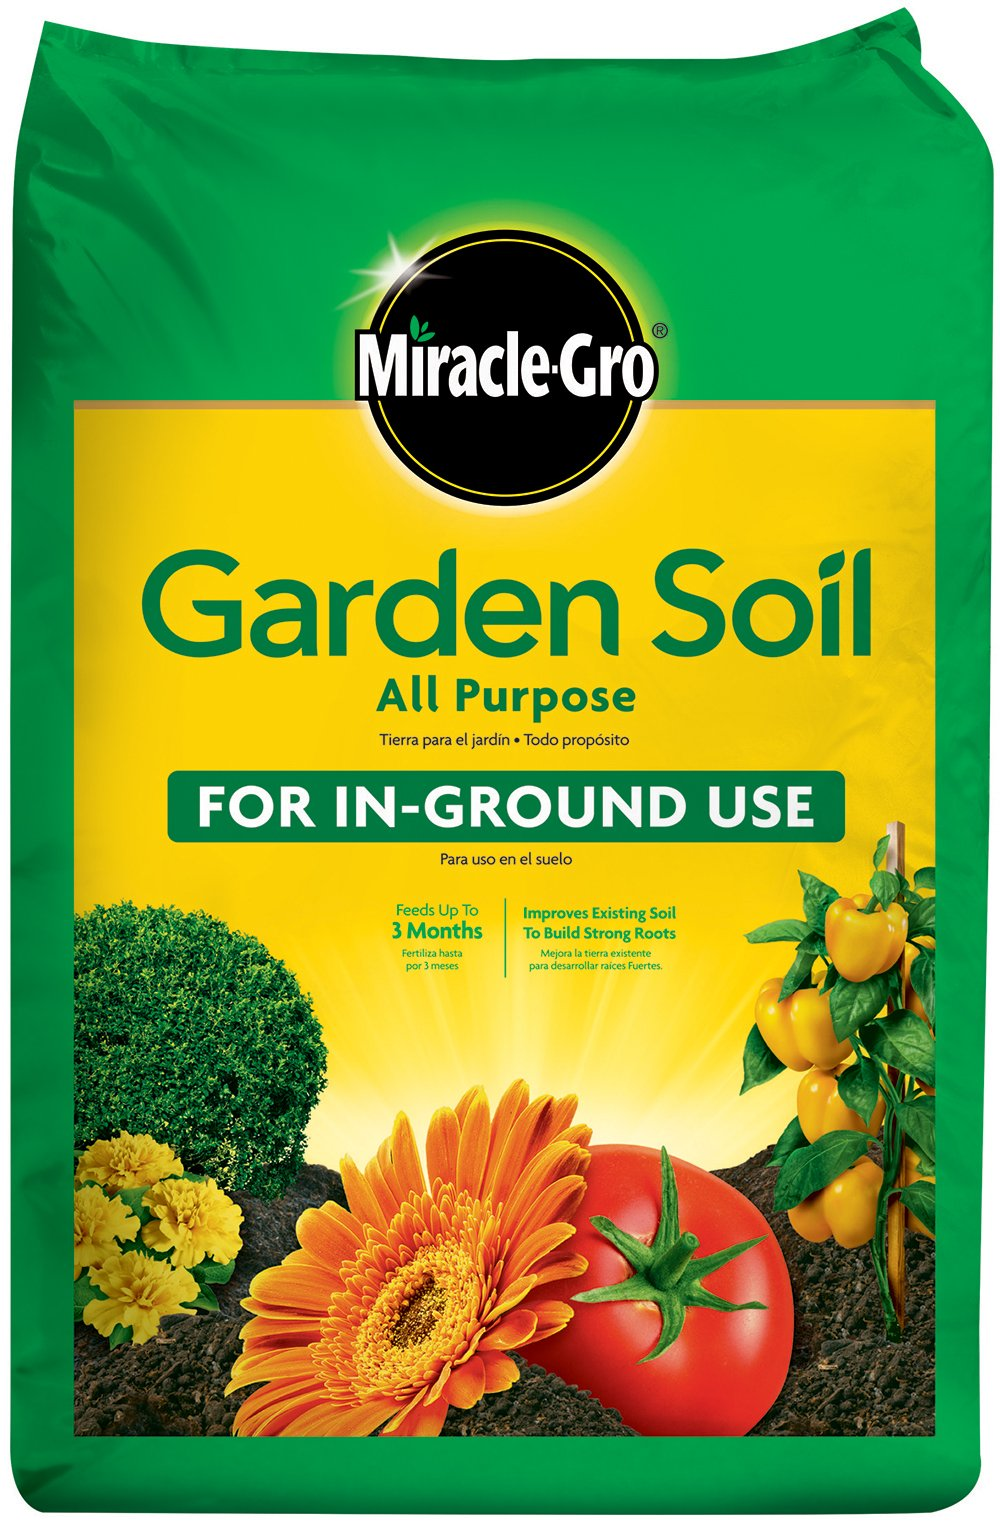 Miracle-Gro 70551430 All-Purpose Garden Soil, 1 CF